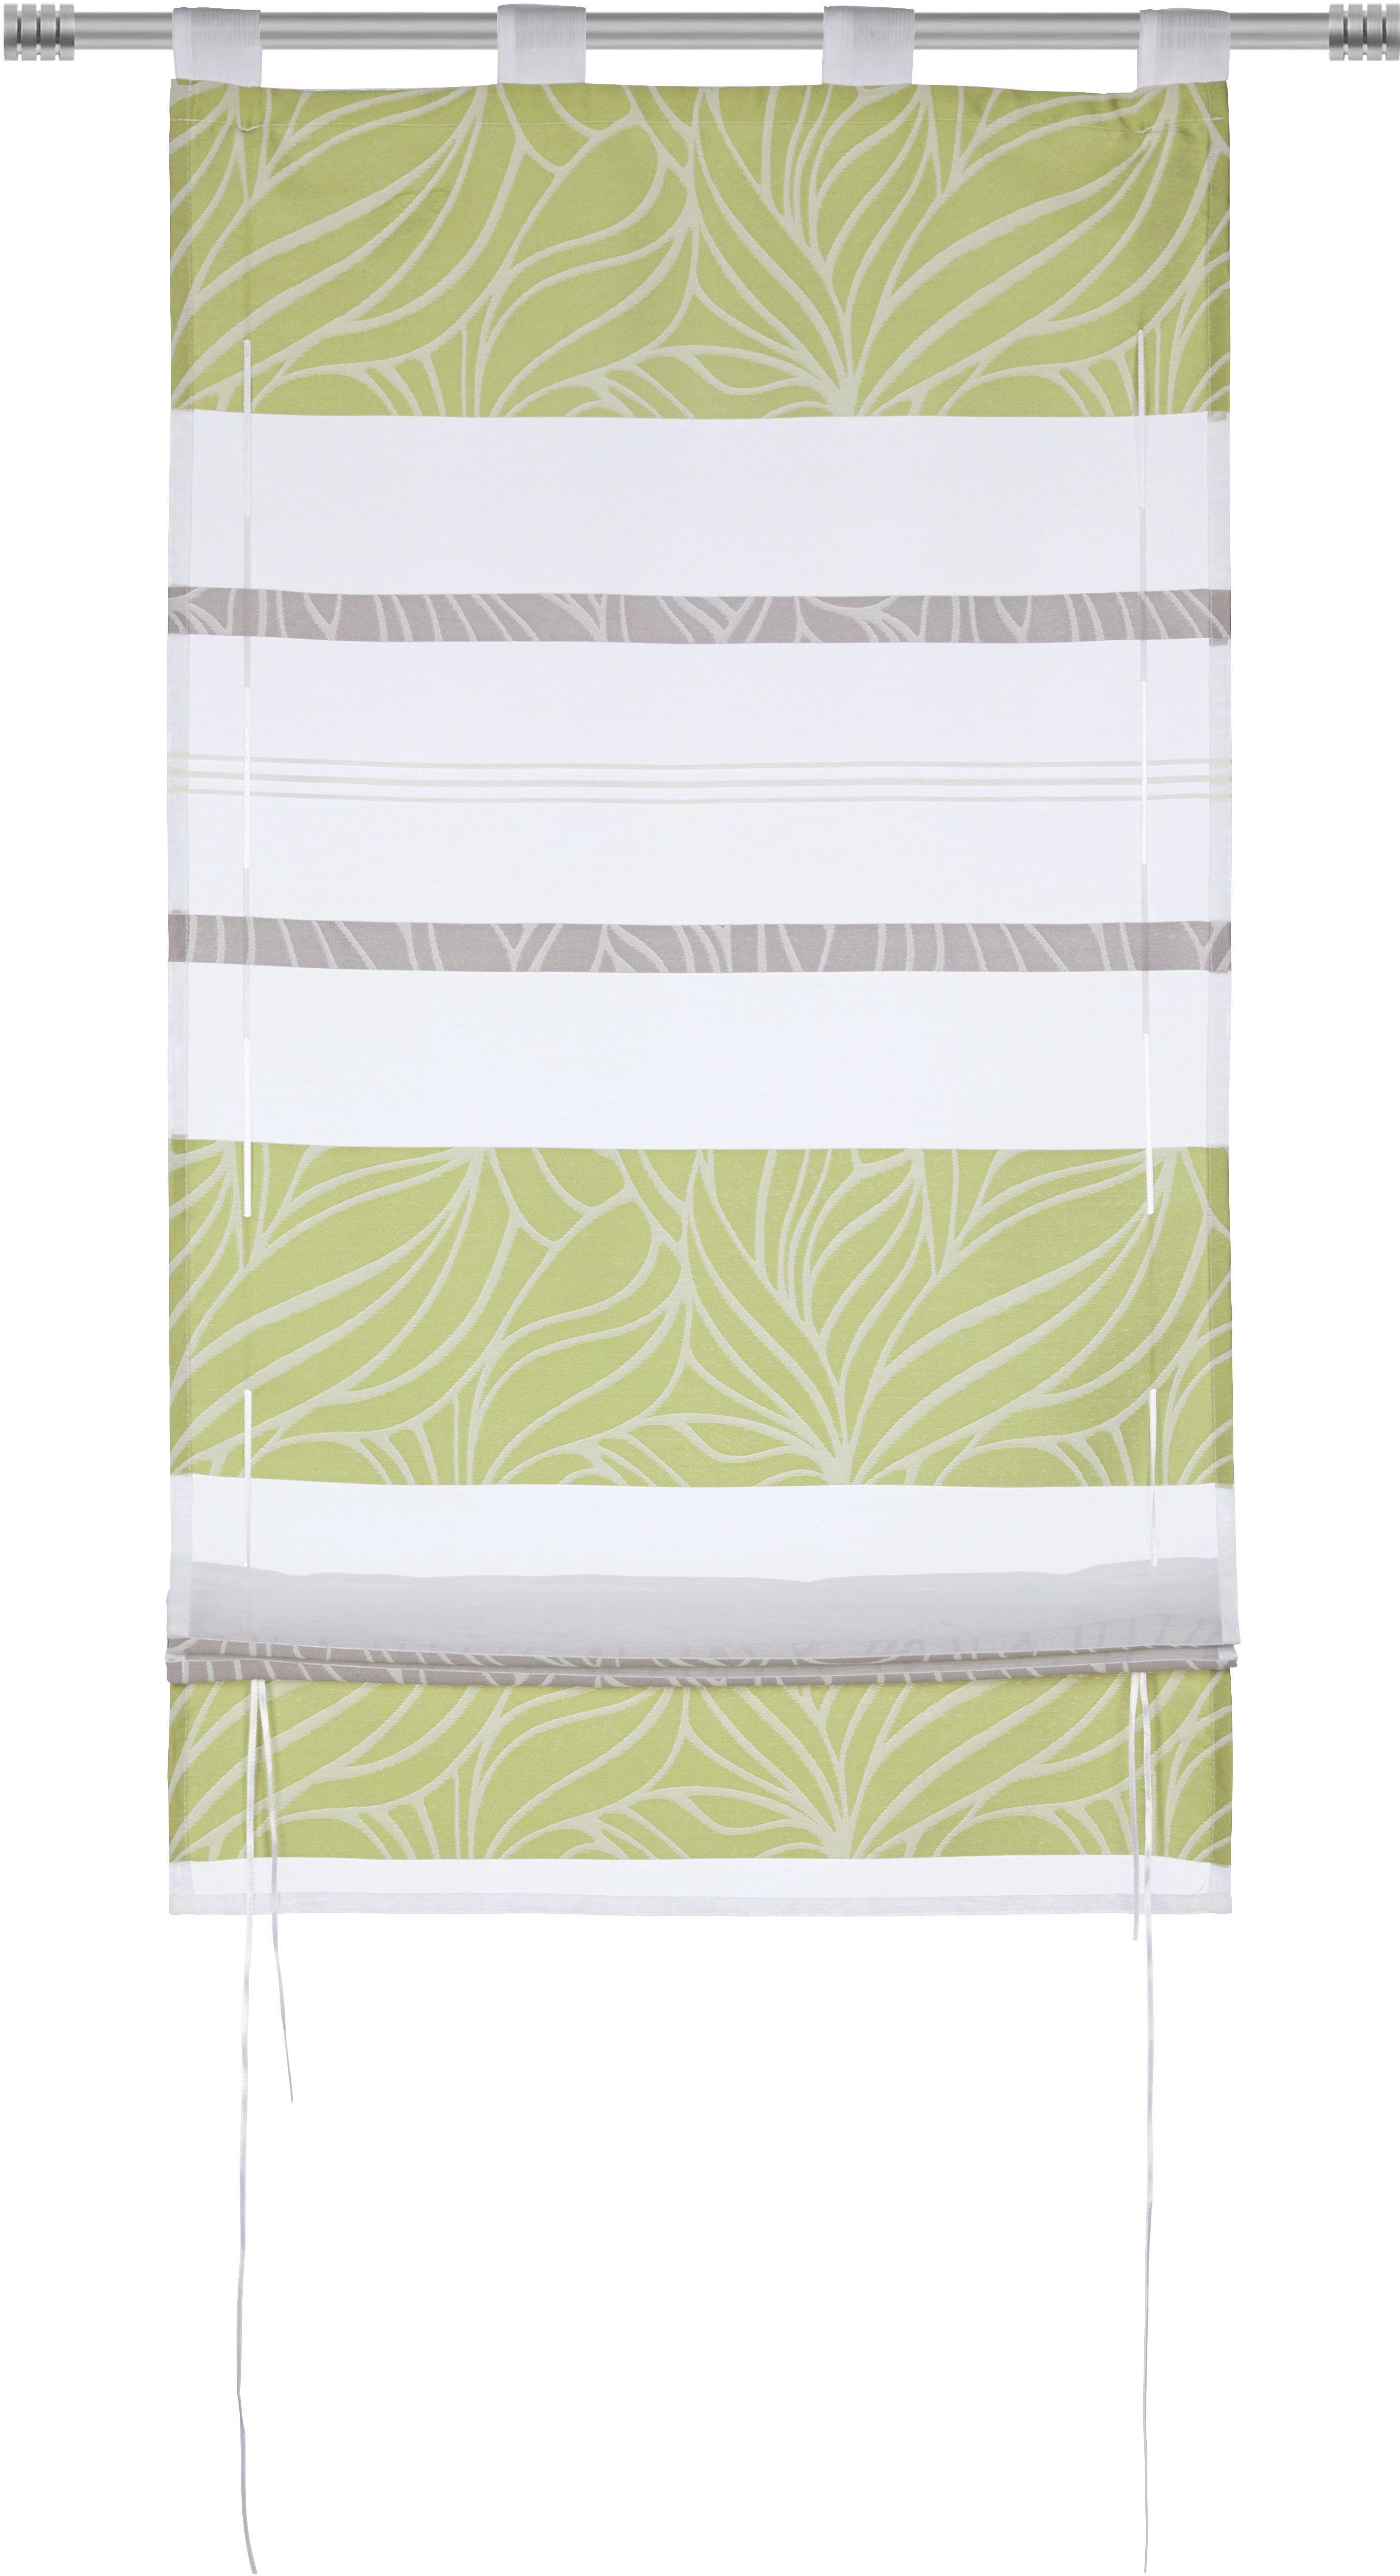 Bändchenrollo Anita, ca. 60x140cm - Grün, KONVENTIONELL, Textil (60/140cm) - MÖMAX modern living